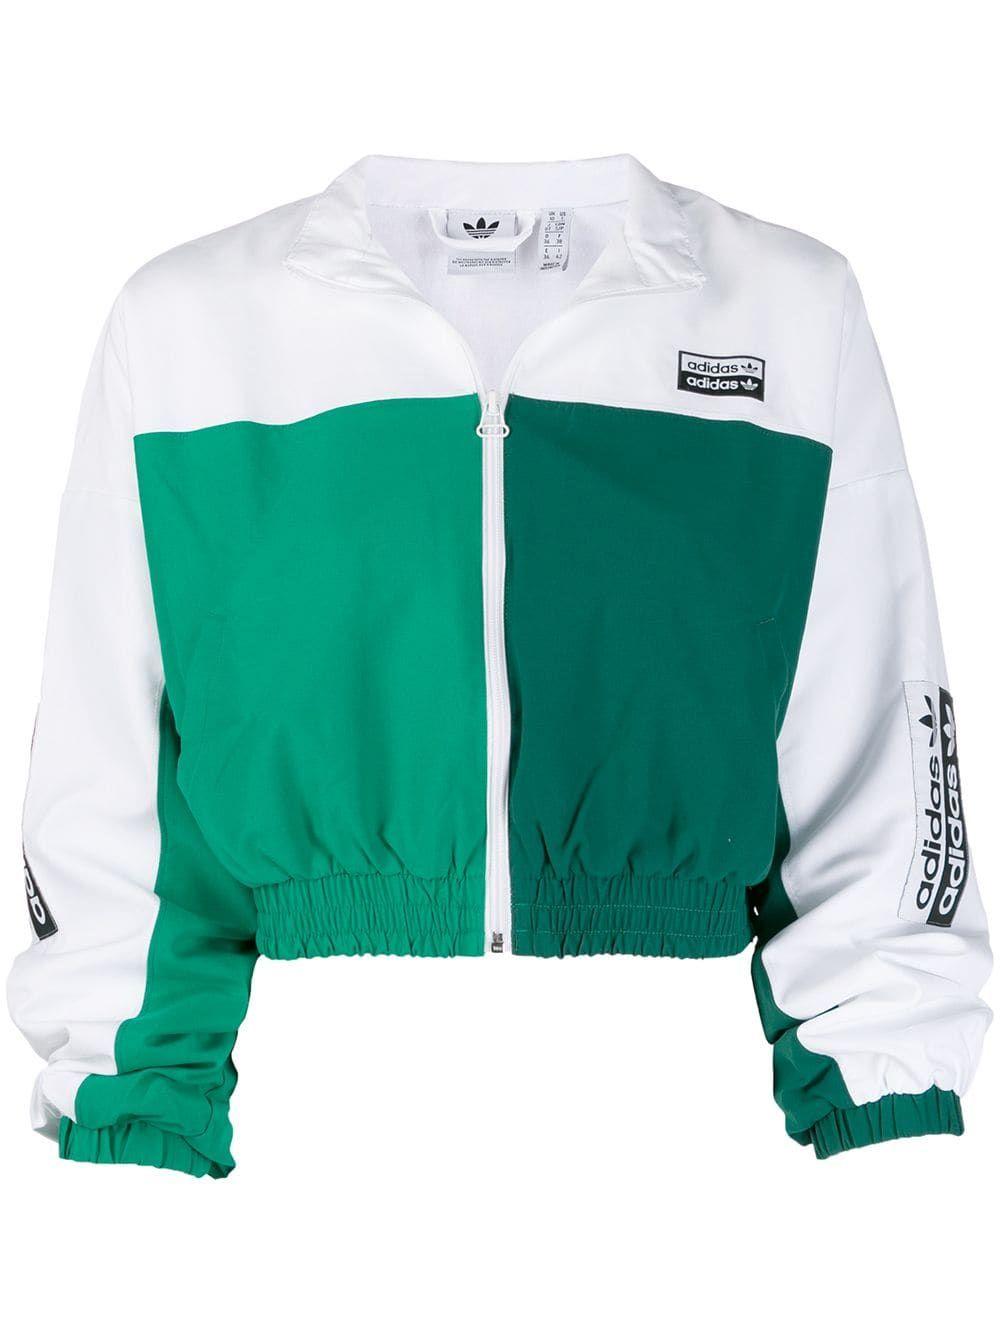 Adidas Cropped Track Jacket Farfetch Adidas Crop Track Jackets Jackets [ 1334 x 1000 Pixel ]